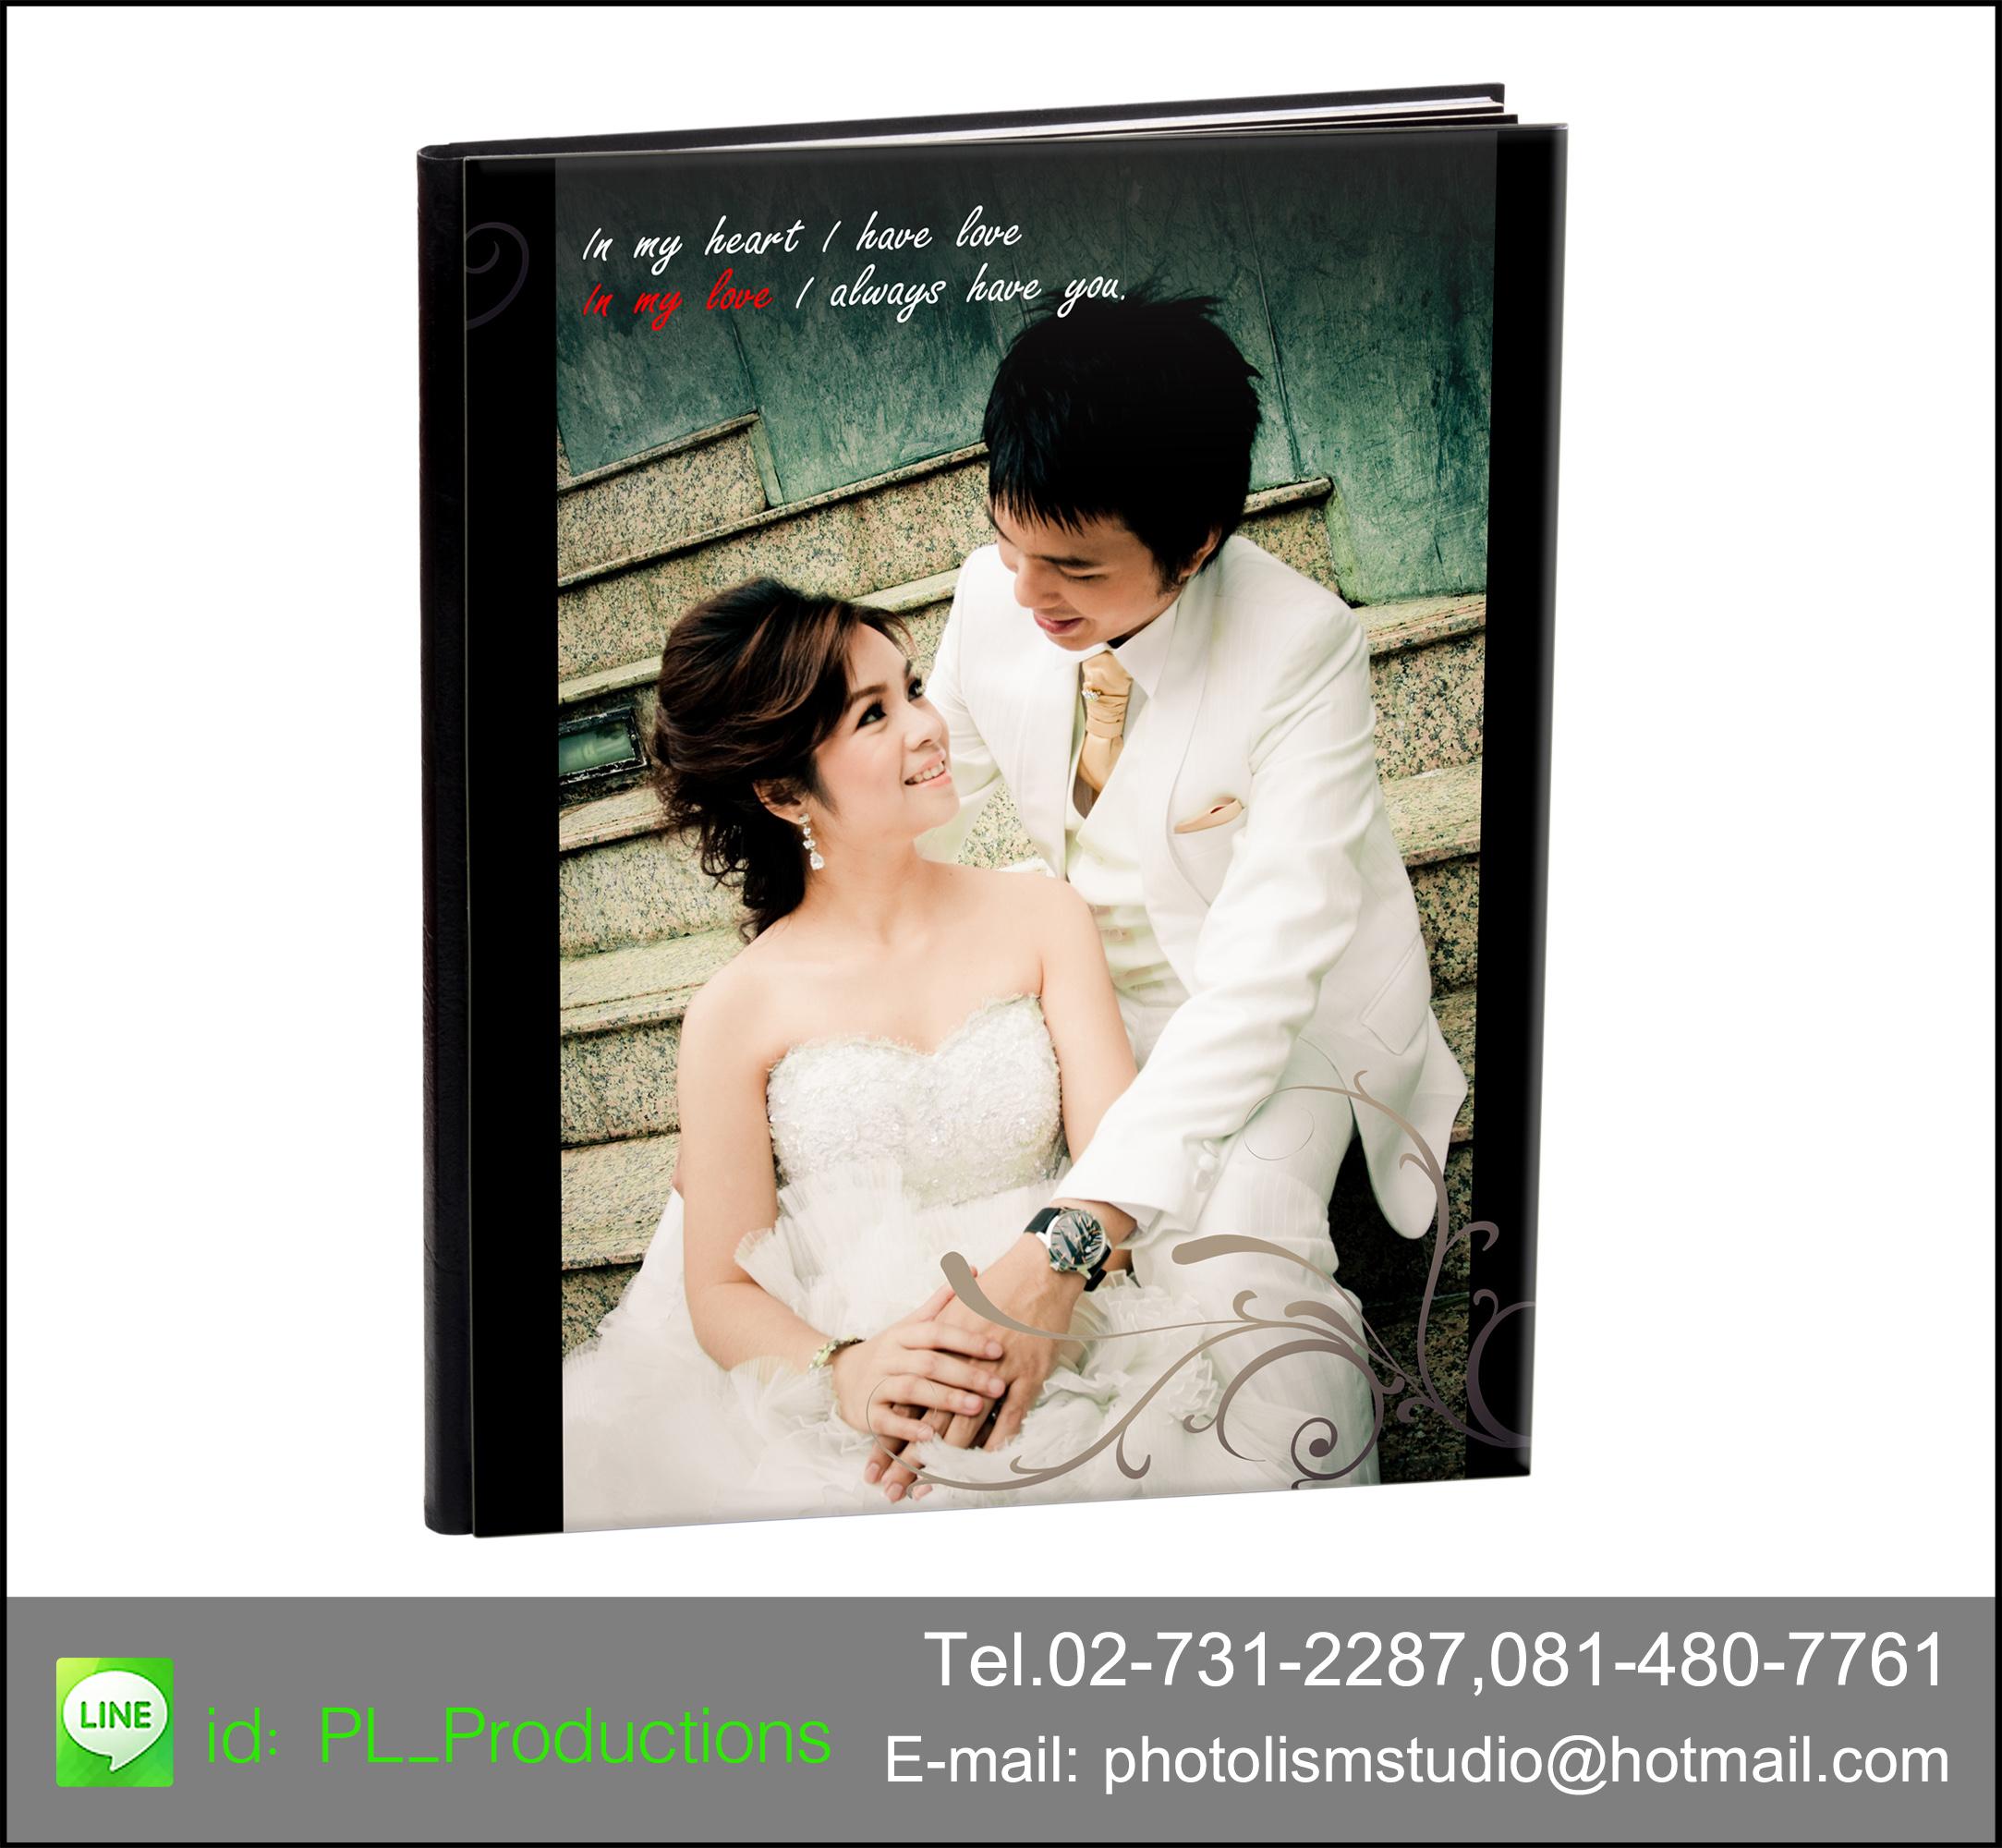 Album LCD ขนาด 12x15 นิ้ว แนวนอน 30 หน้า ปกอะครีลิค